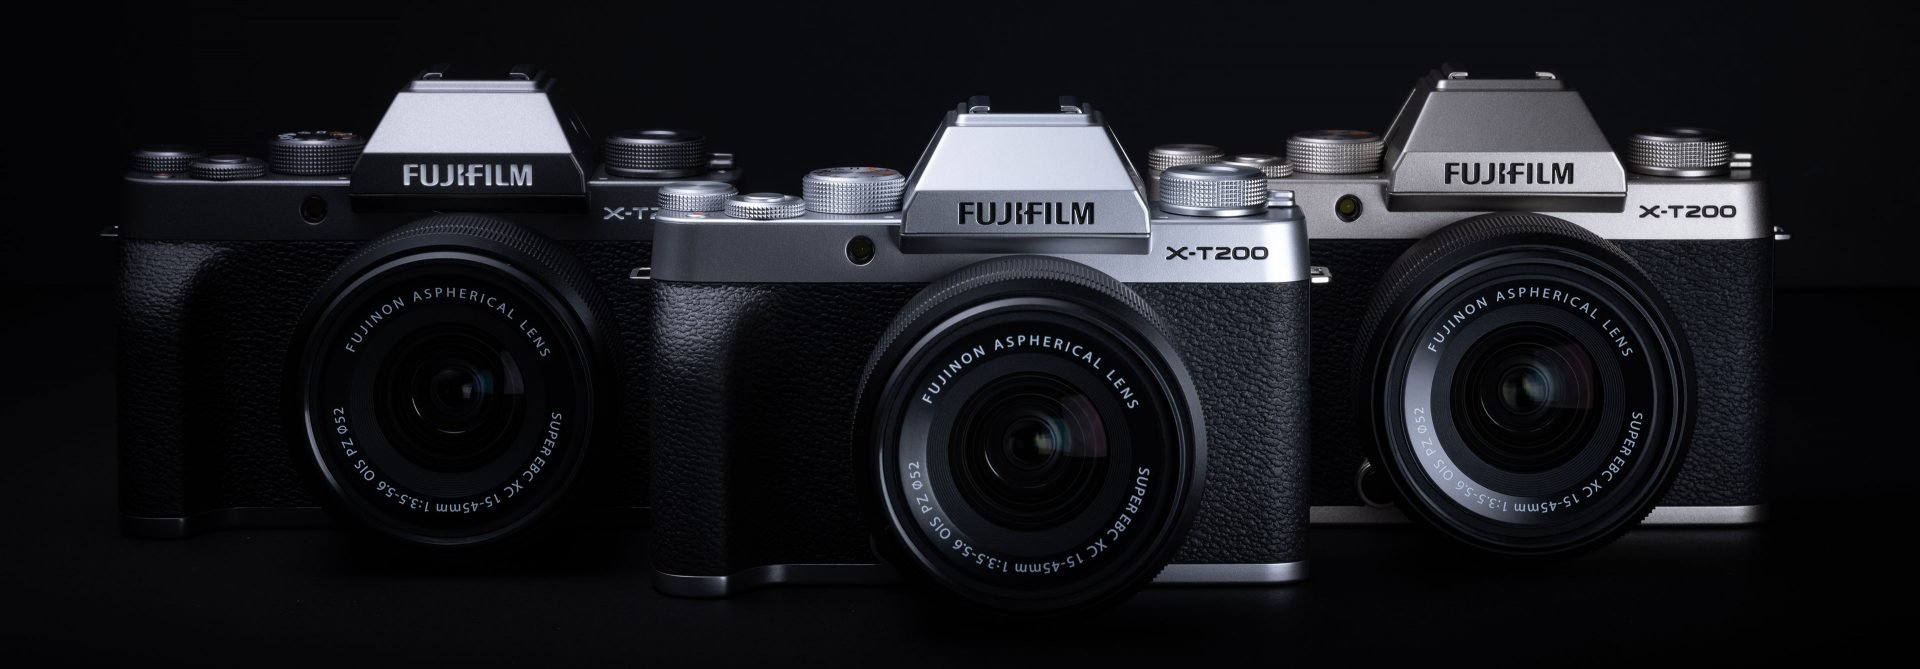 fujifilm-xt200-header1